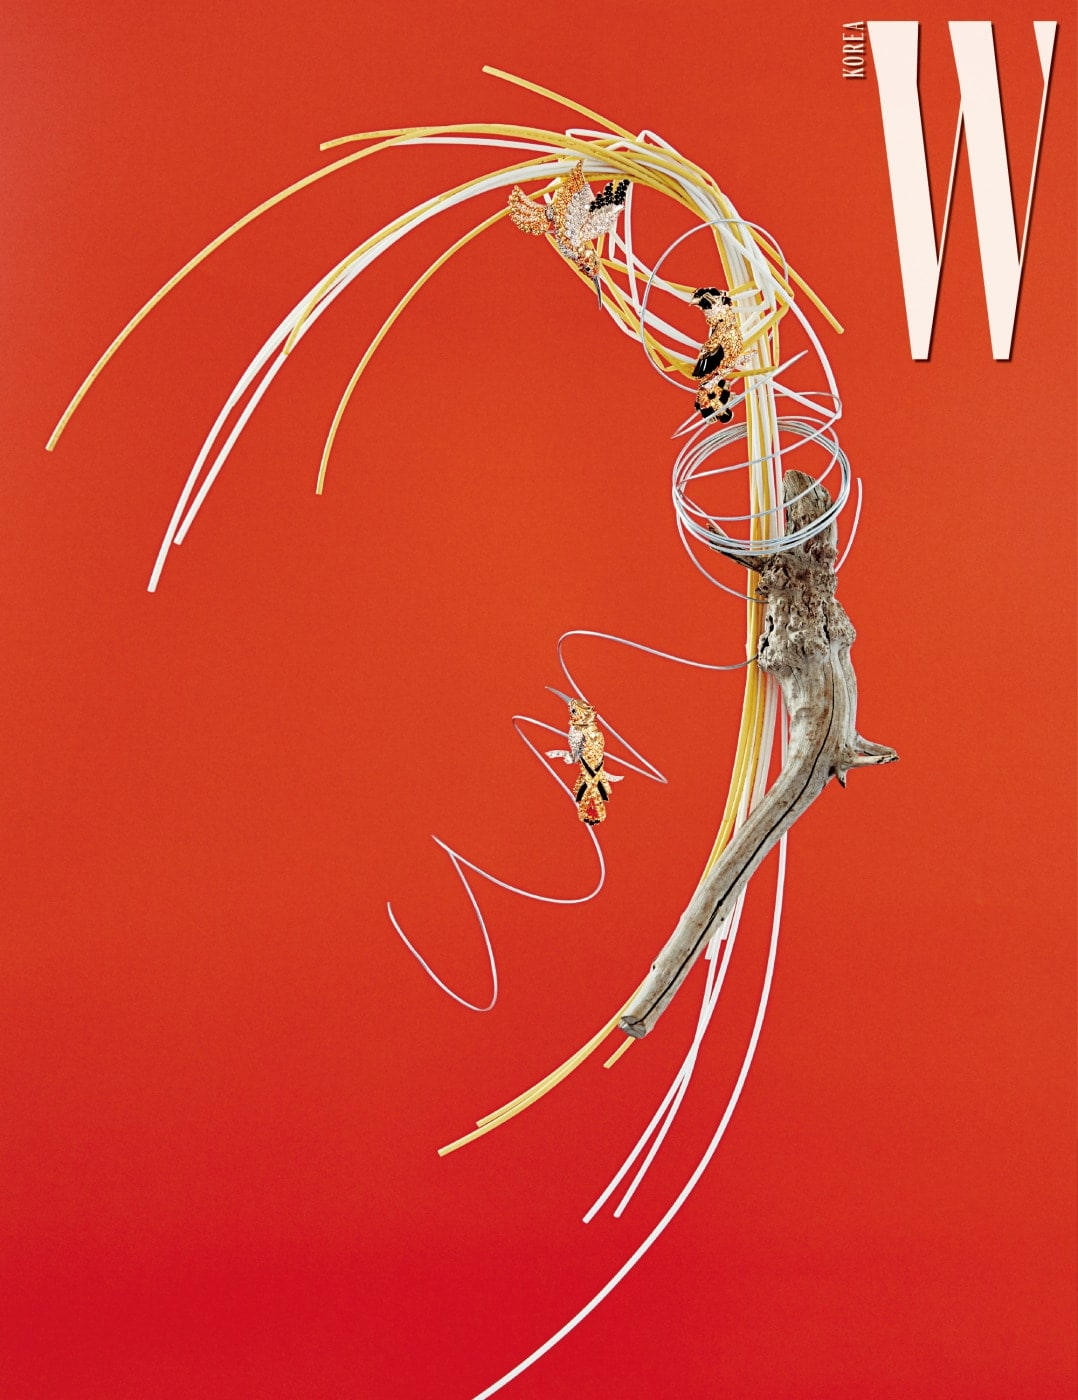 WK1803-well반클리프아펠수정 23